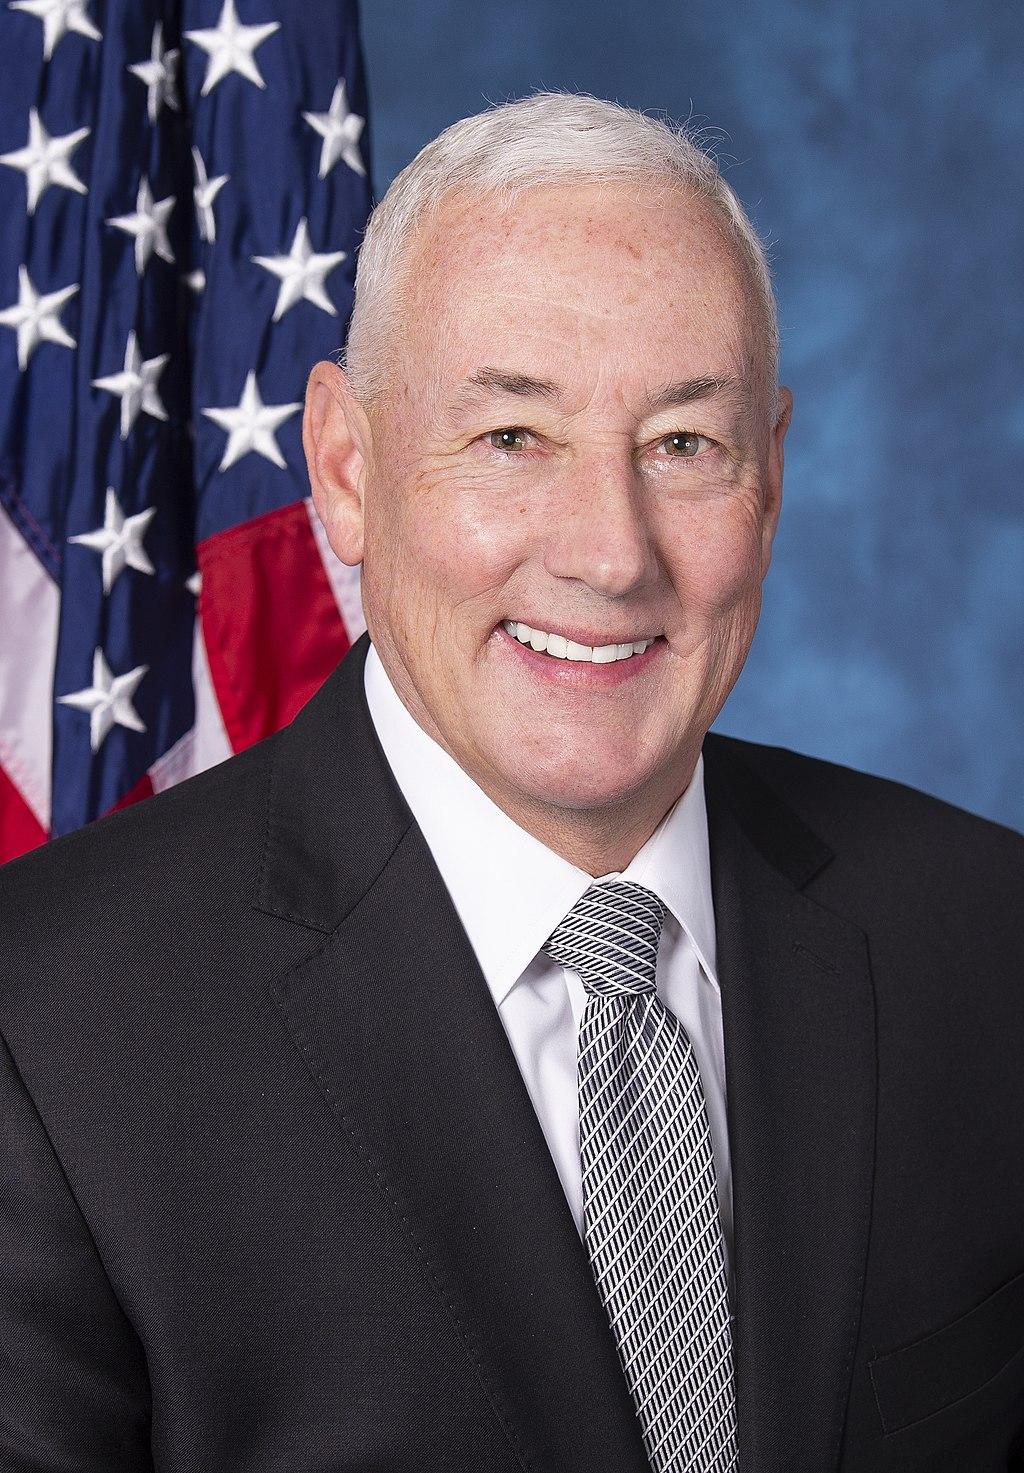 Representative PENCE GREG